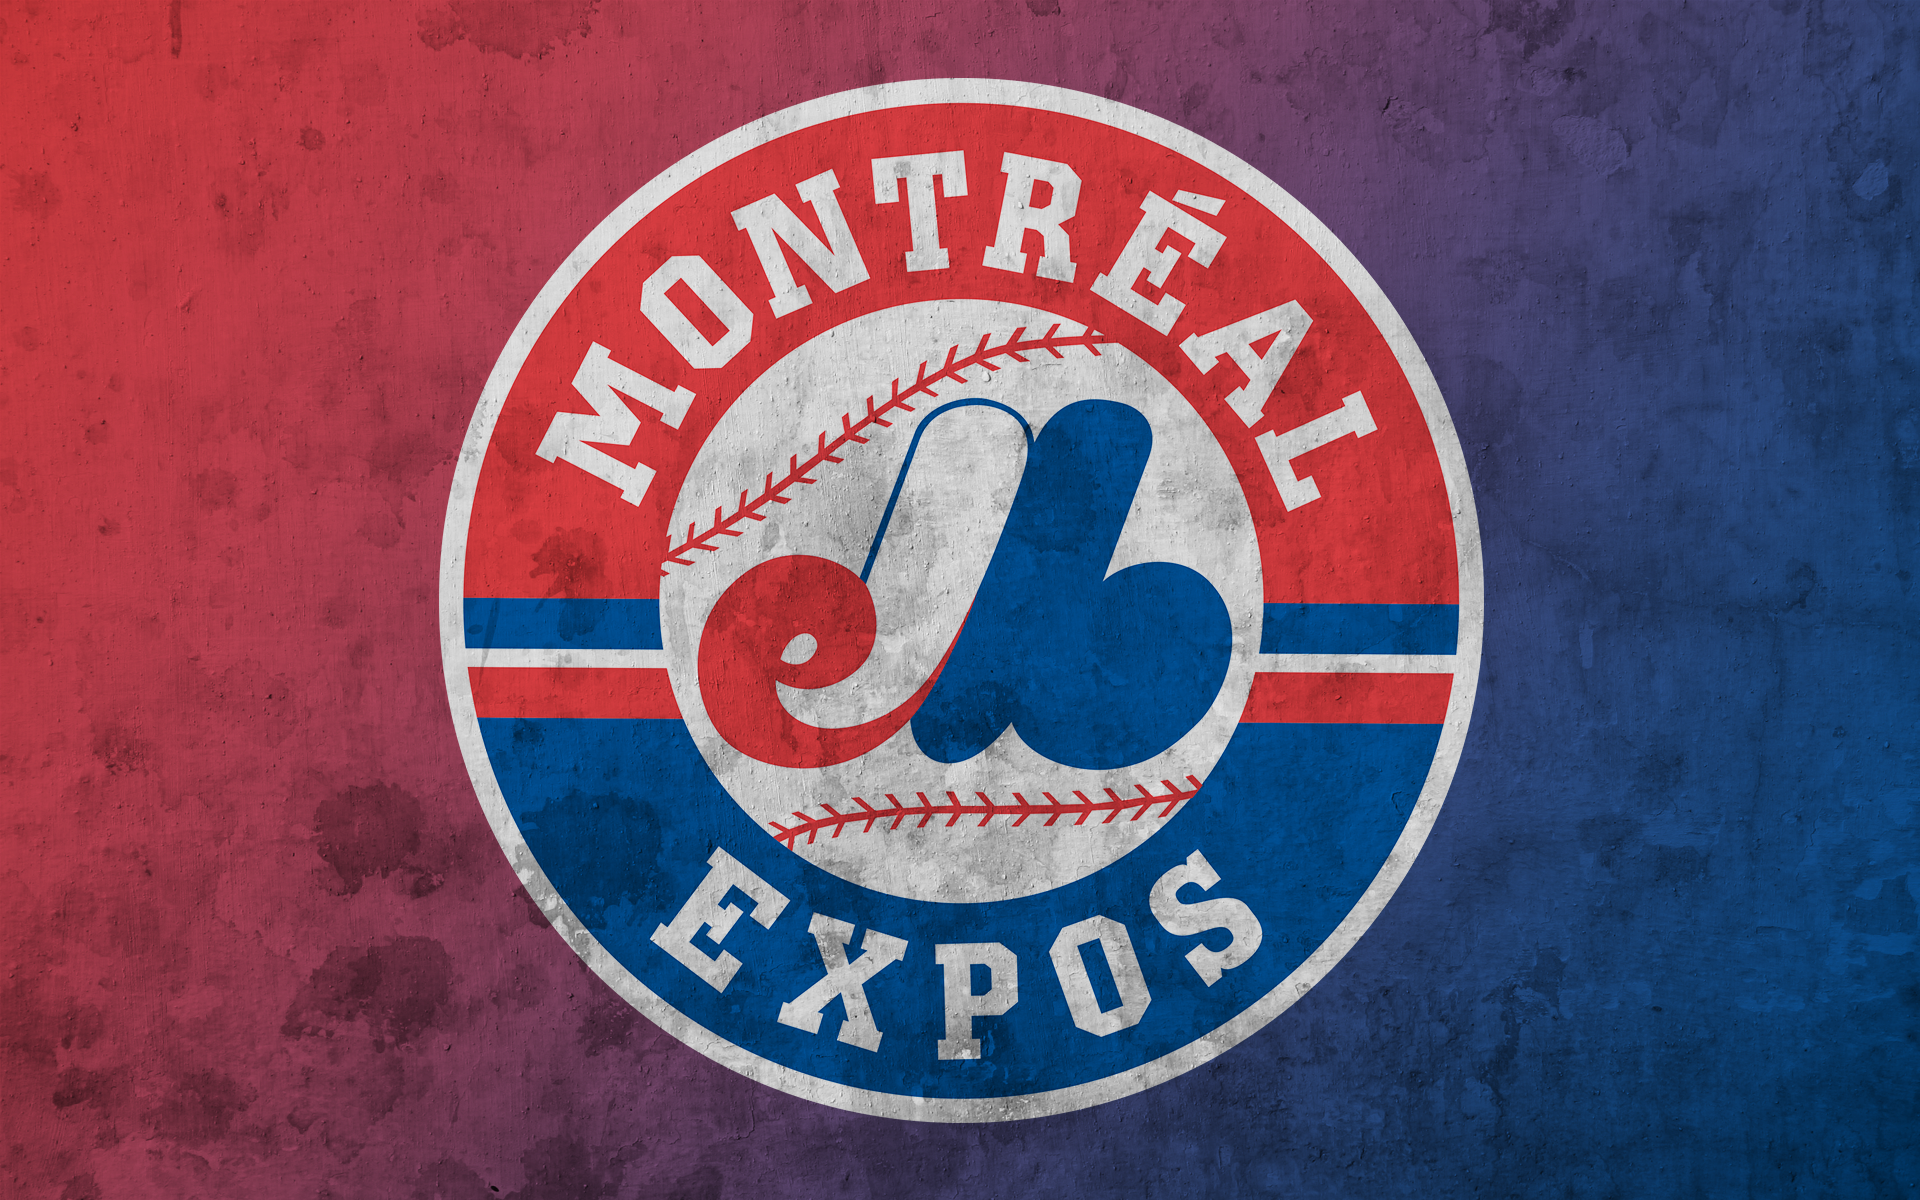 ... Expos club logo ...